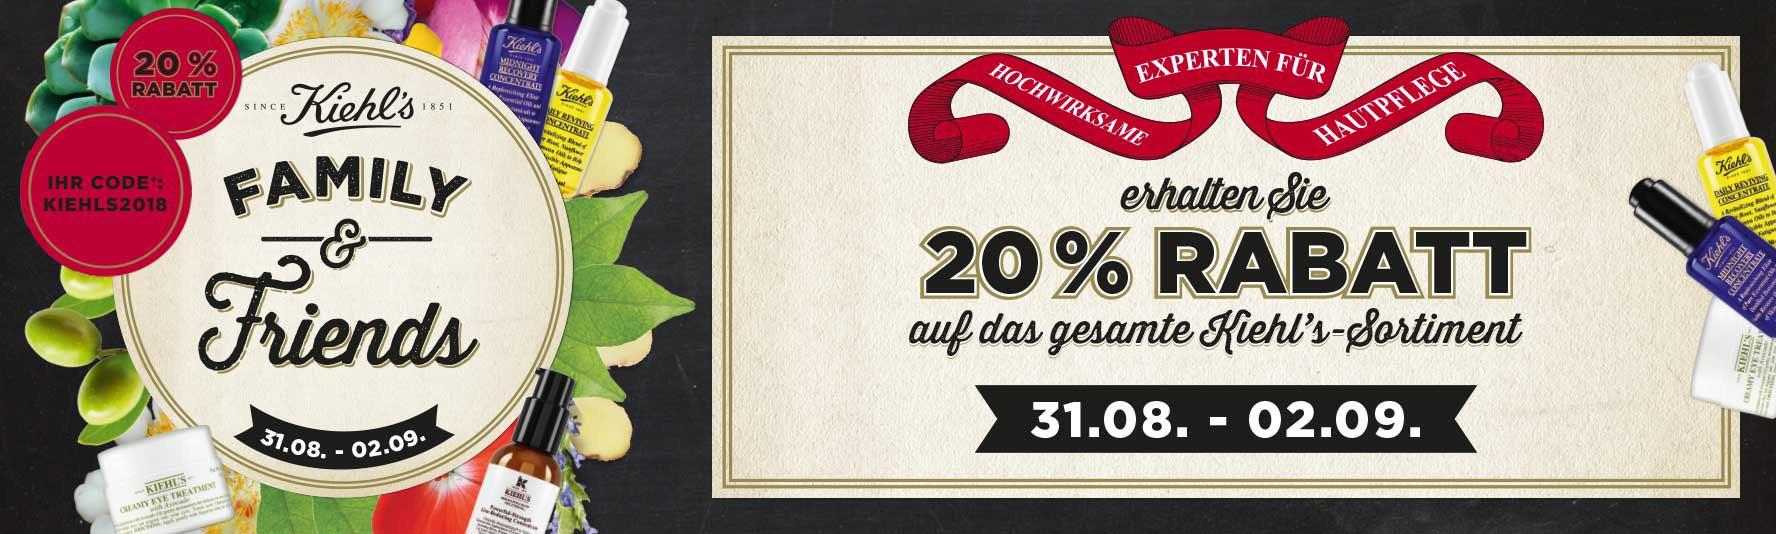 [Breuninger - offline & online] 20% Rabatt auf das Kiehl's Sortiment. Keine VSK.